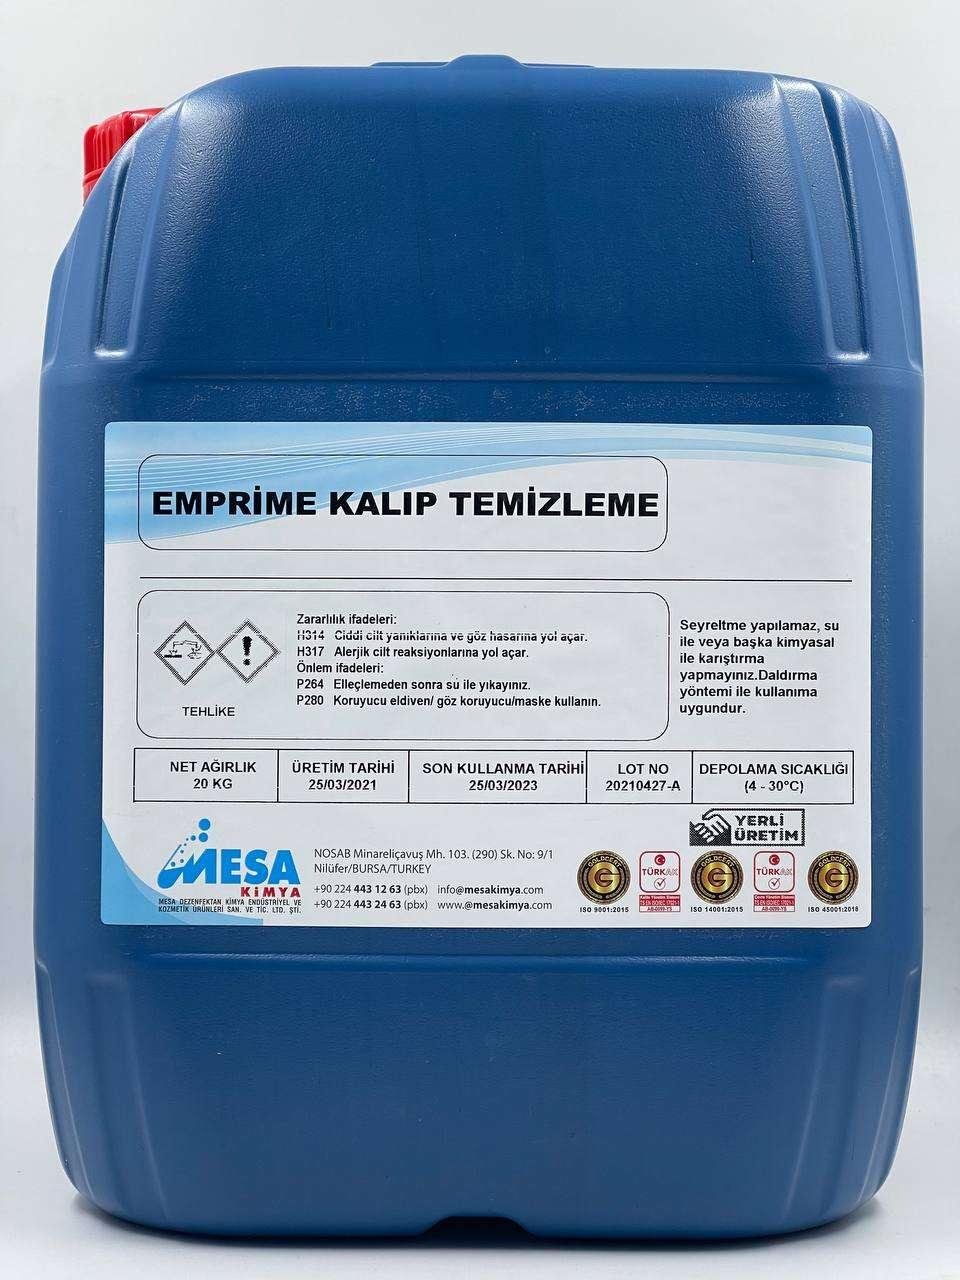 Emprime kalıp temizleme solventi EMPISOL